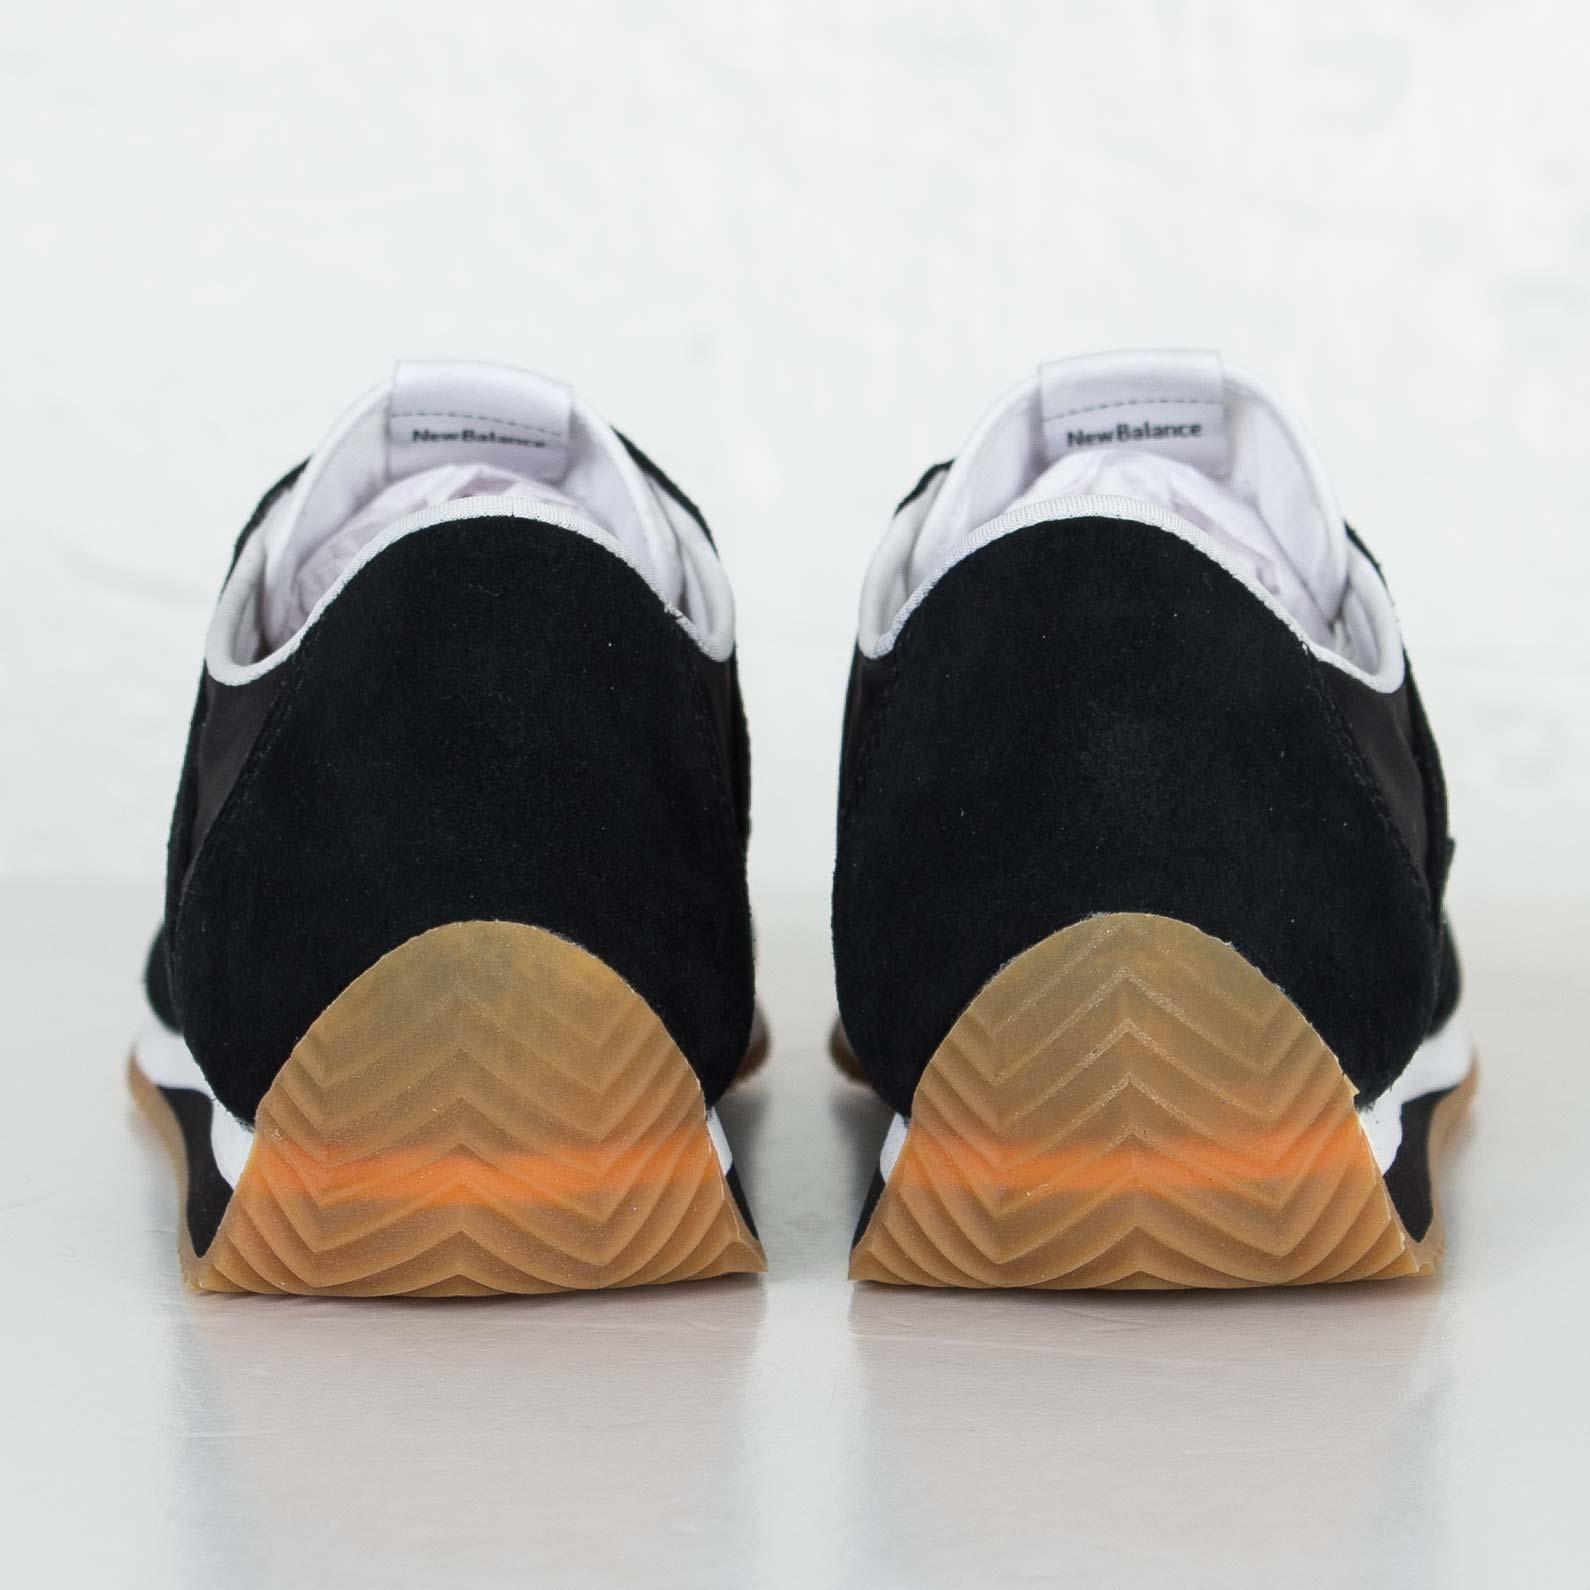 Instalar en pc Invertir Punto de referencia  New Balance U320 - U320ac - Sneakersnstuff | sneakers & streetwear online  since 1999